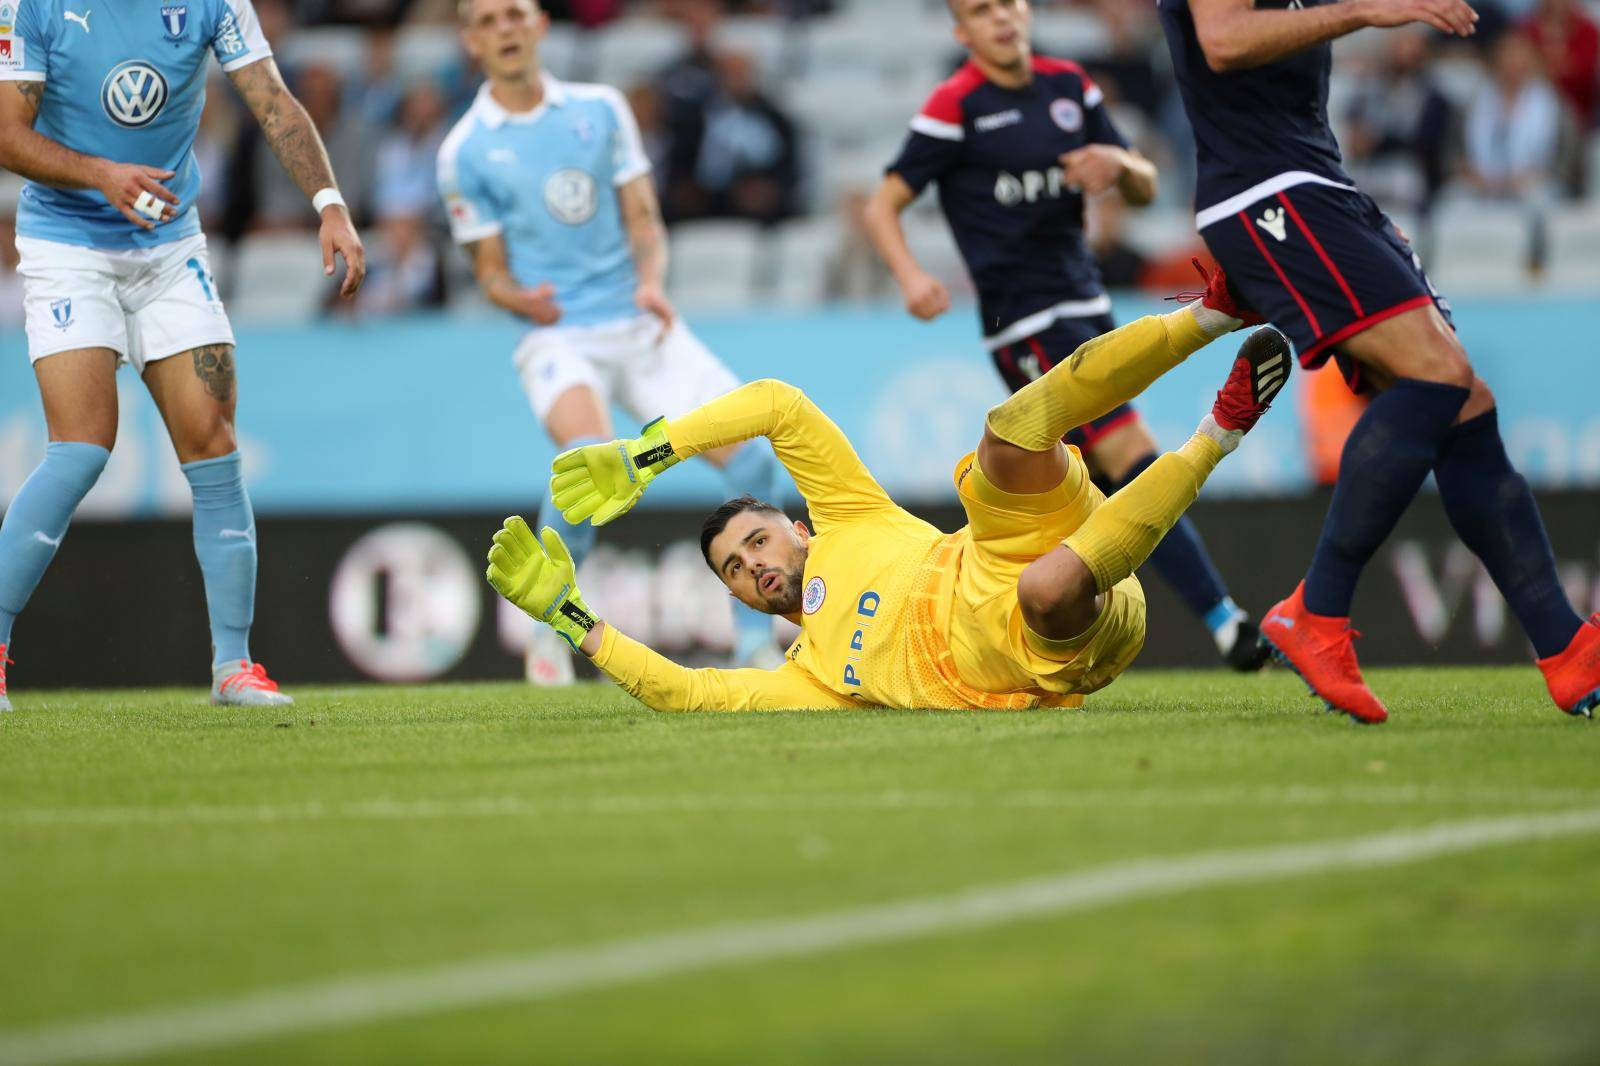 UEFA Europa League - third qualifying round - Malmo FF v Zrinjski Mostar